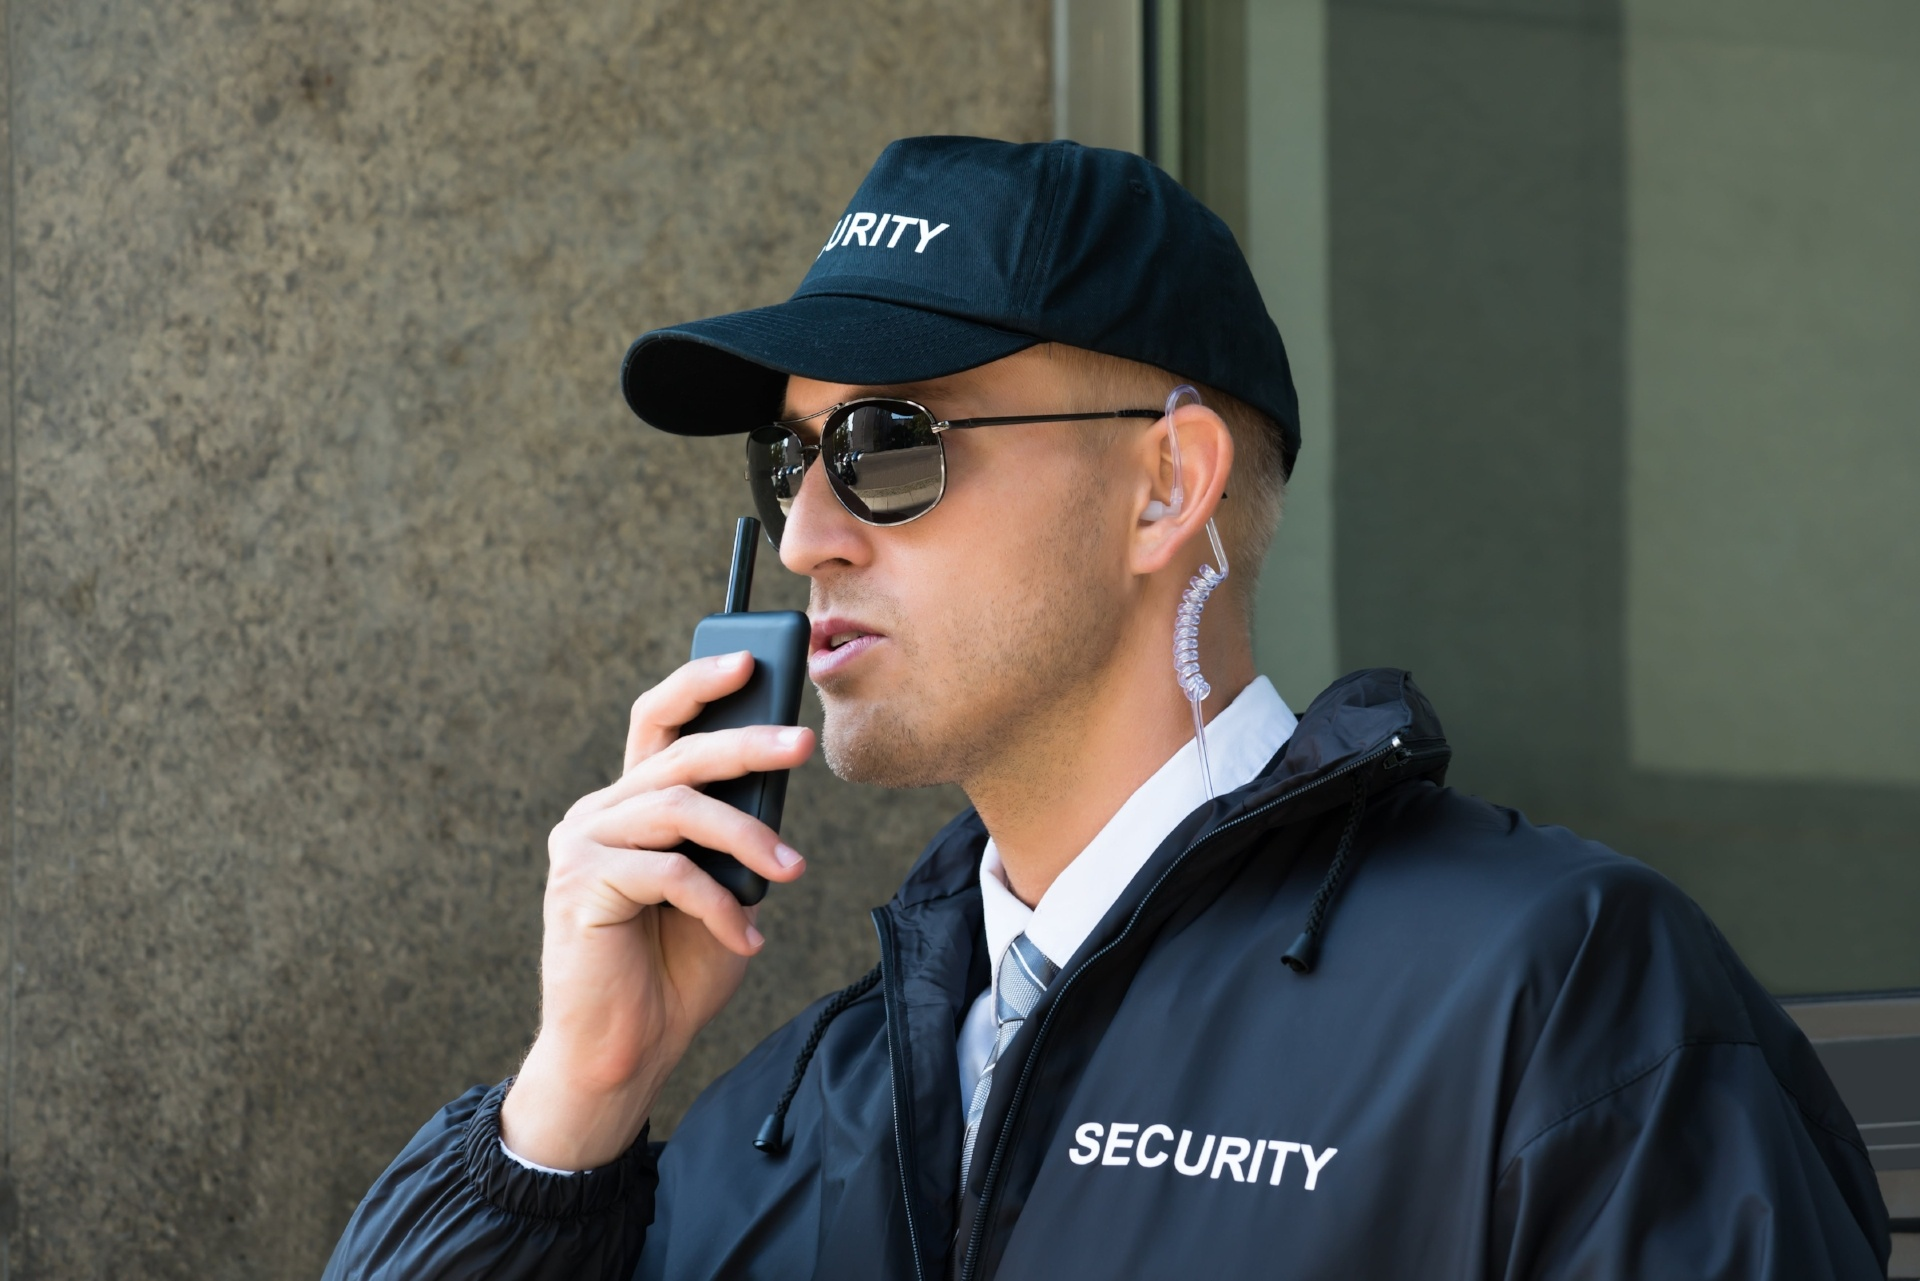 Security office on a walkie-talkie